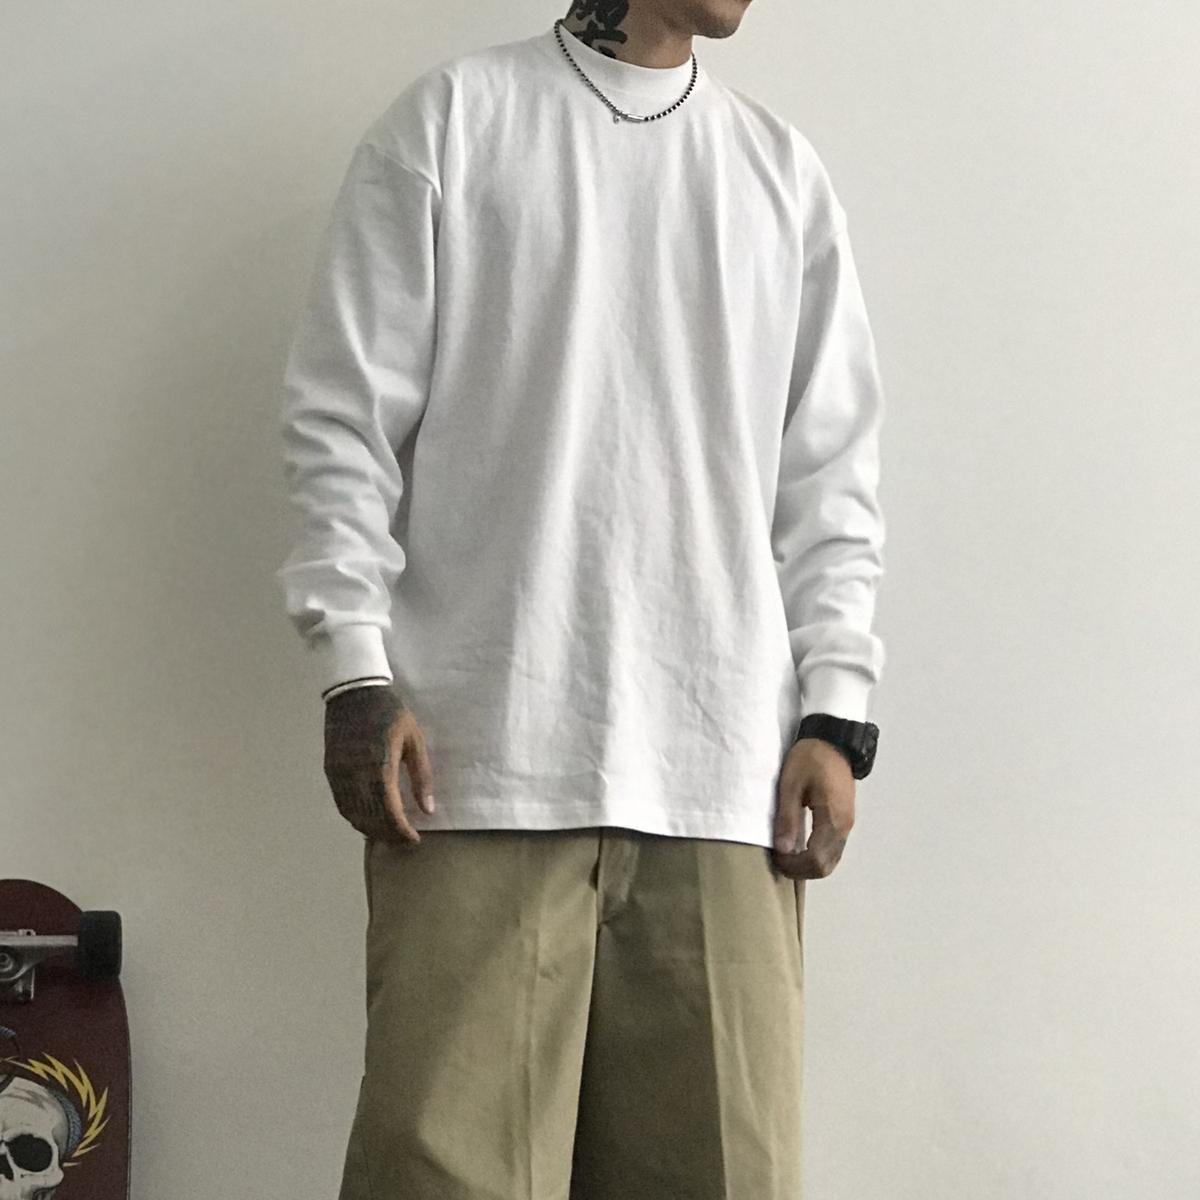 bboy练舞popping hiphop街舞old school小领重磅纯色打底长袖t��